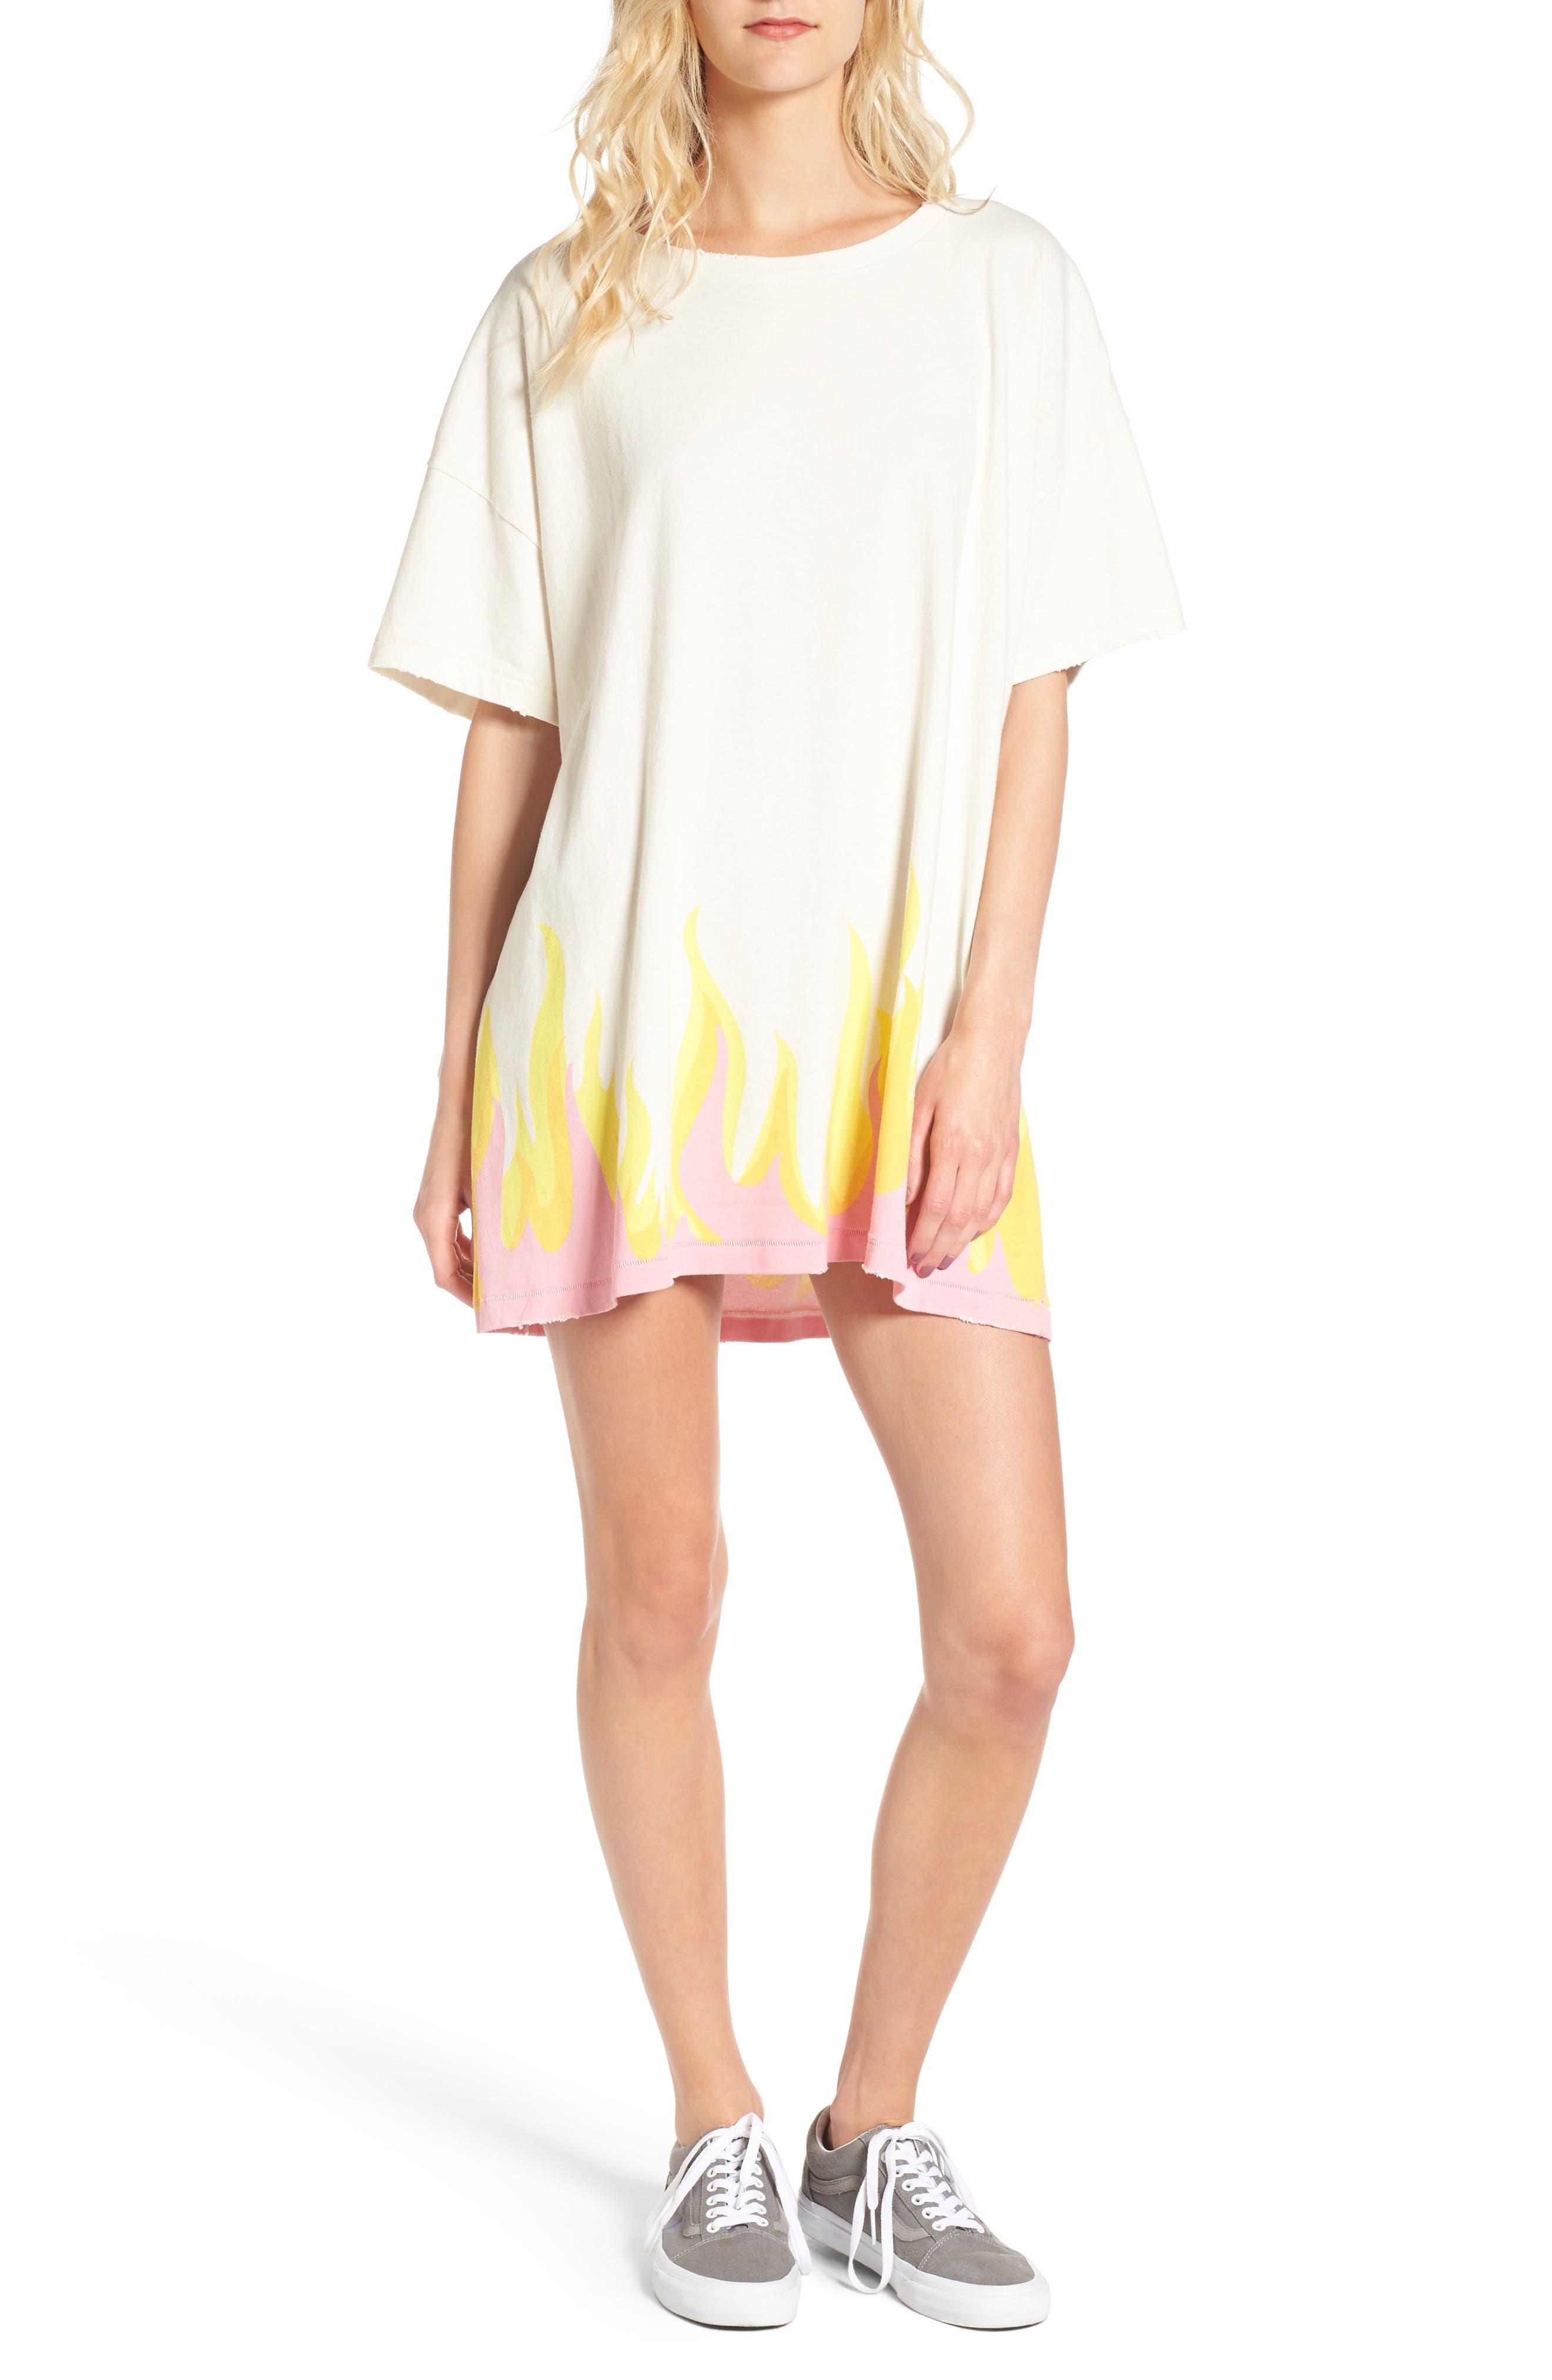 Wildfire T-Shirt Dress,                             Main thumbnail 1, color,                             901